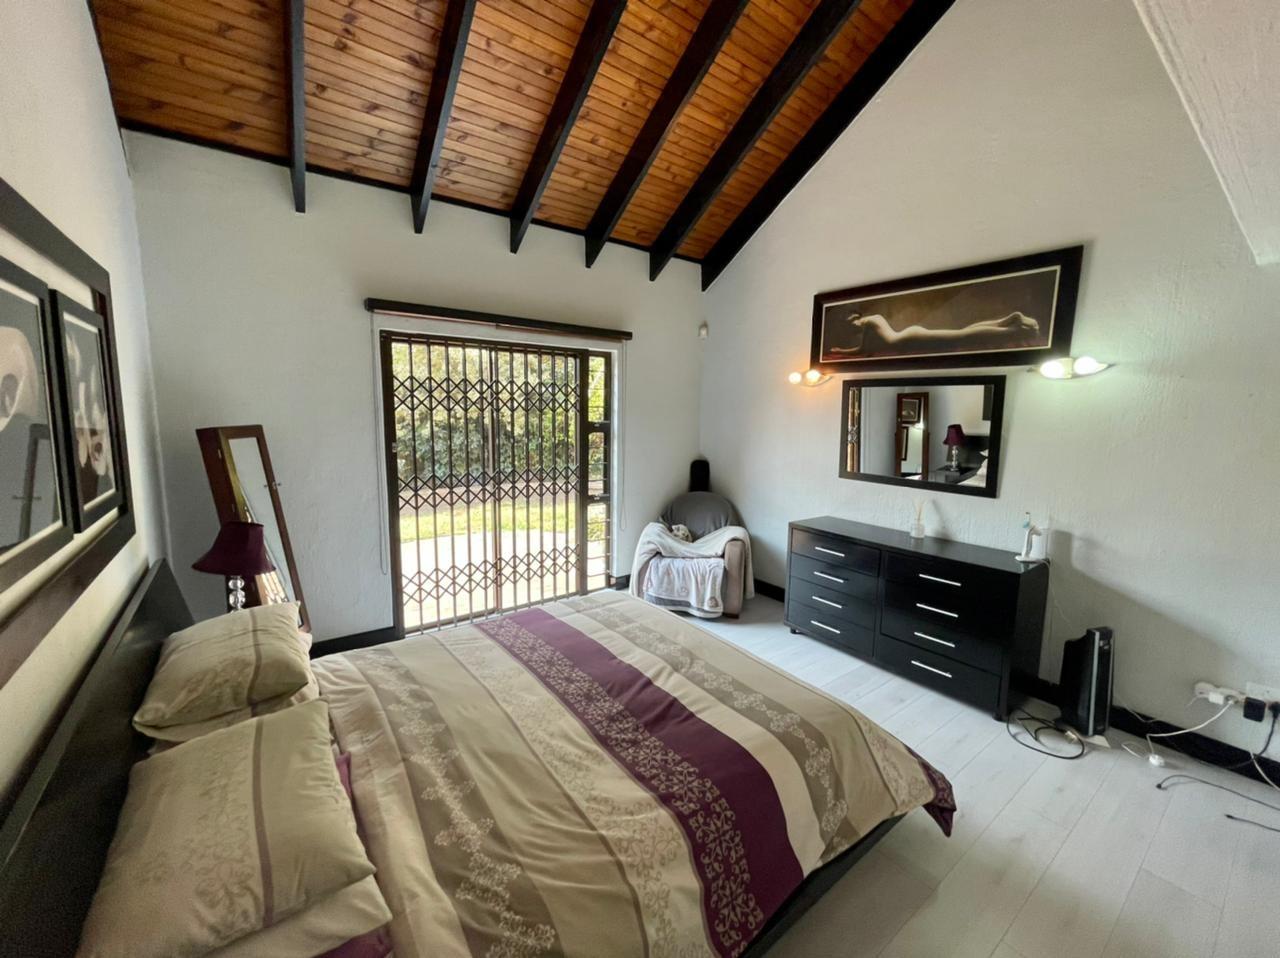 4 Bedroom Townhouse For Sale in Bedfordview